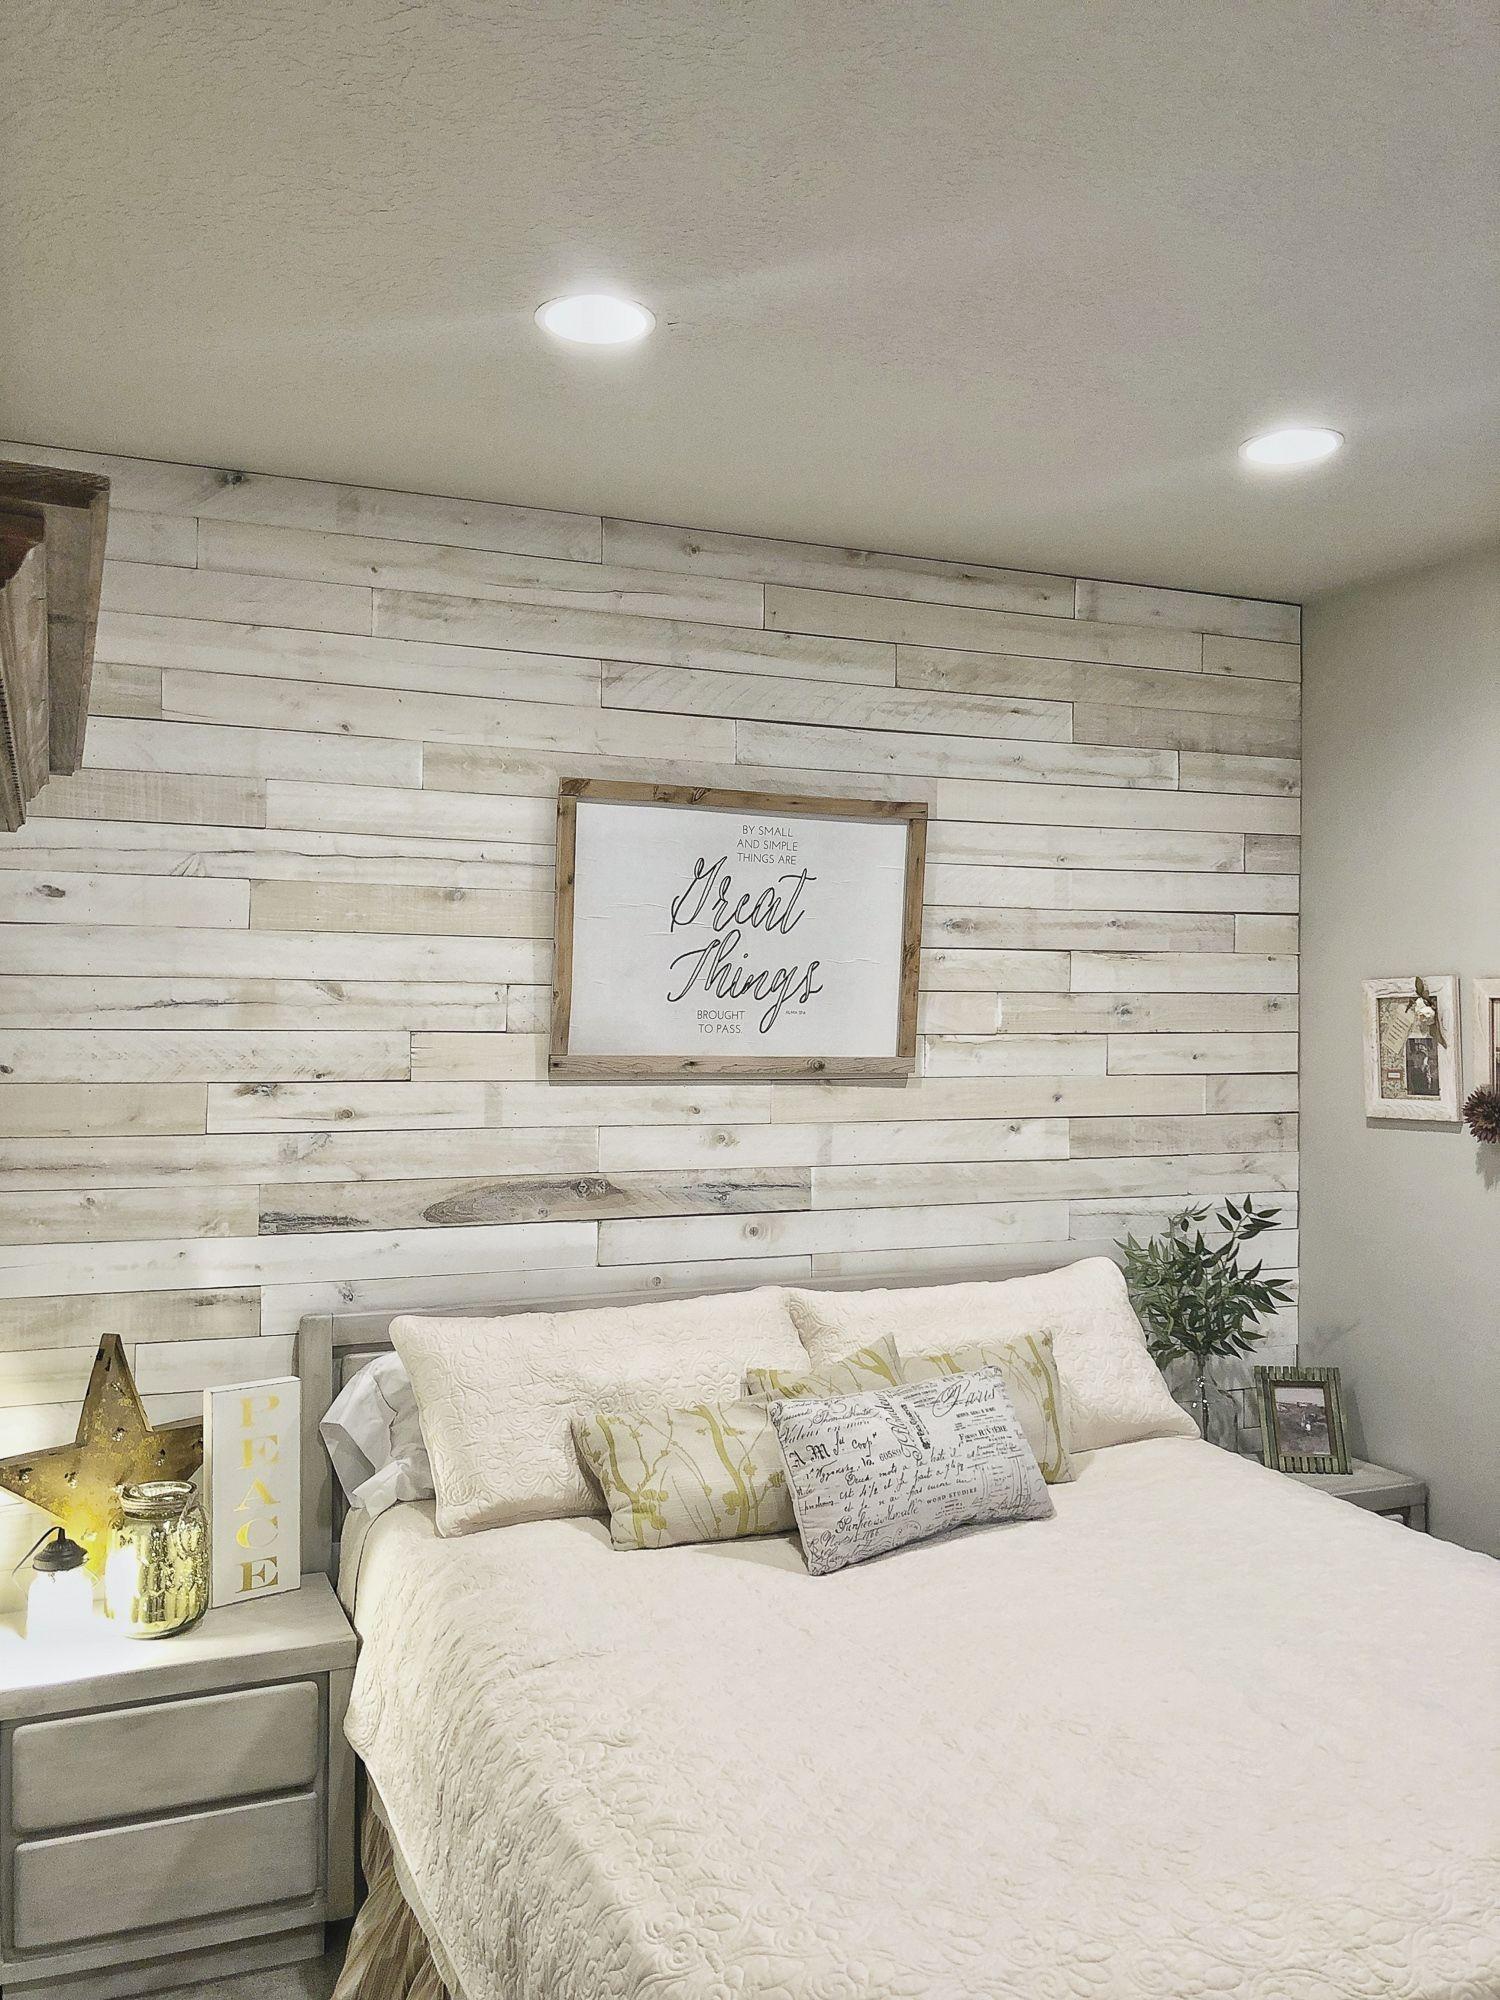 Unique Wood Walls Design Ideas For Your Home07